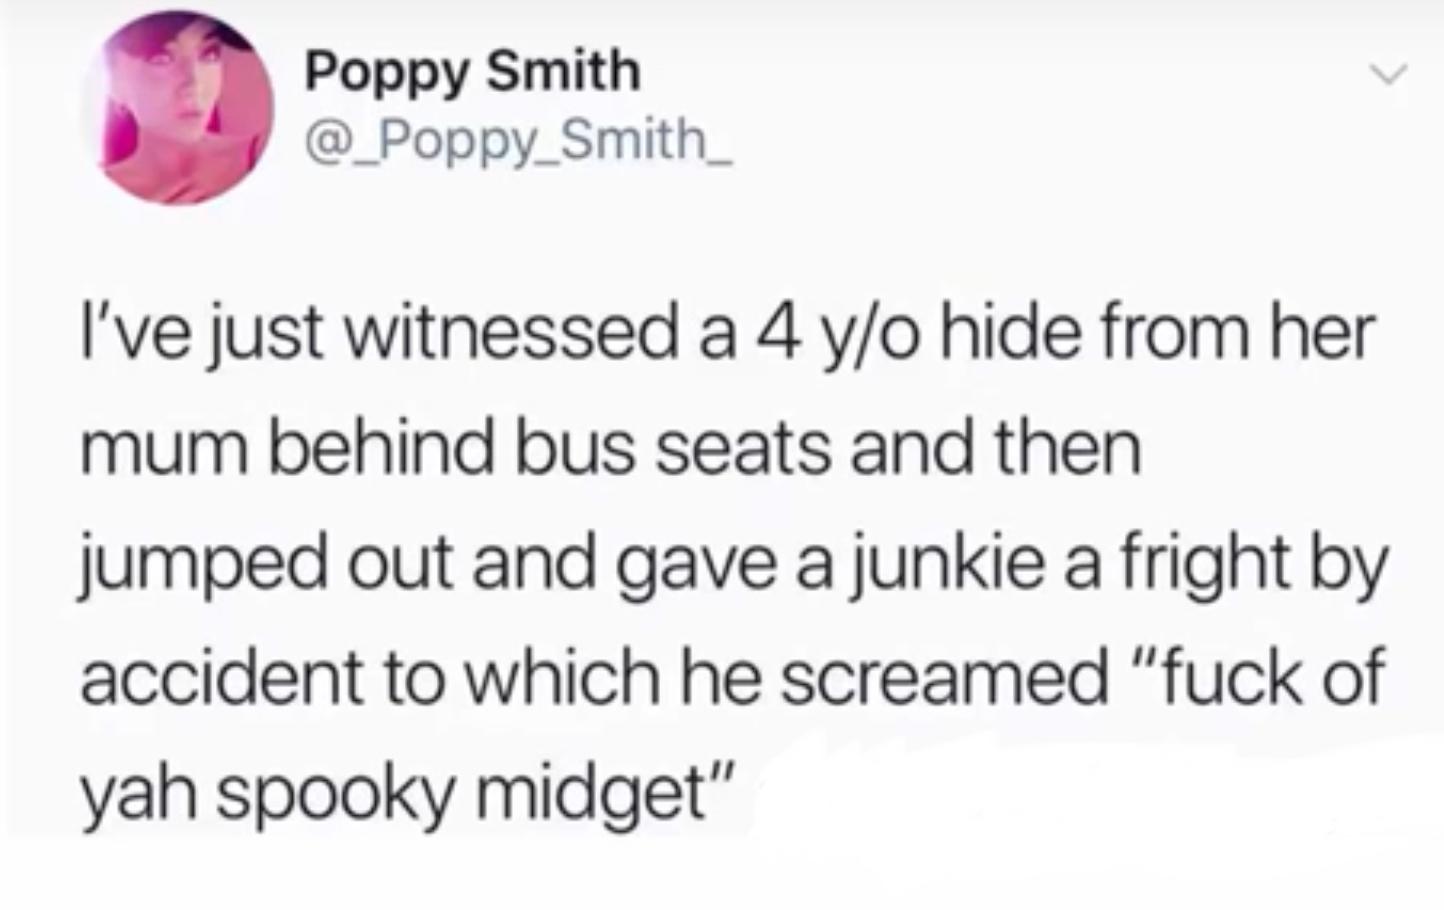 Spooky scary midgets - meme